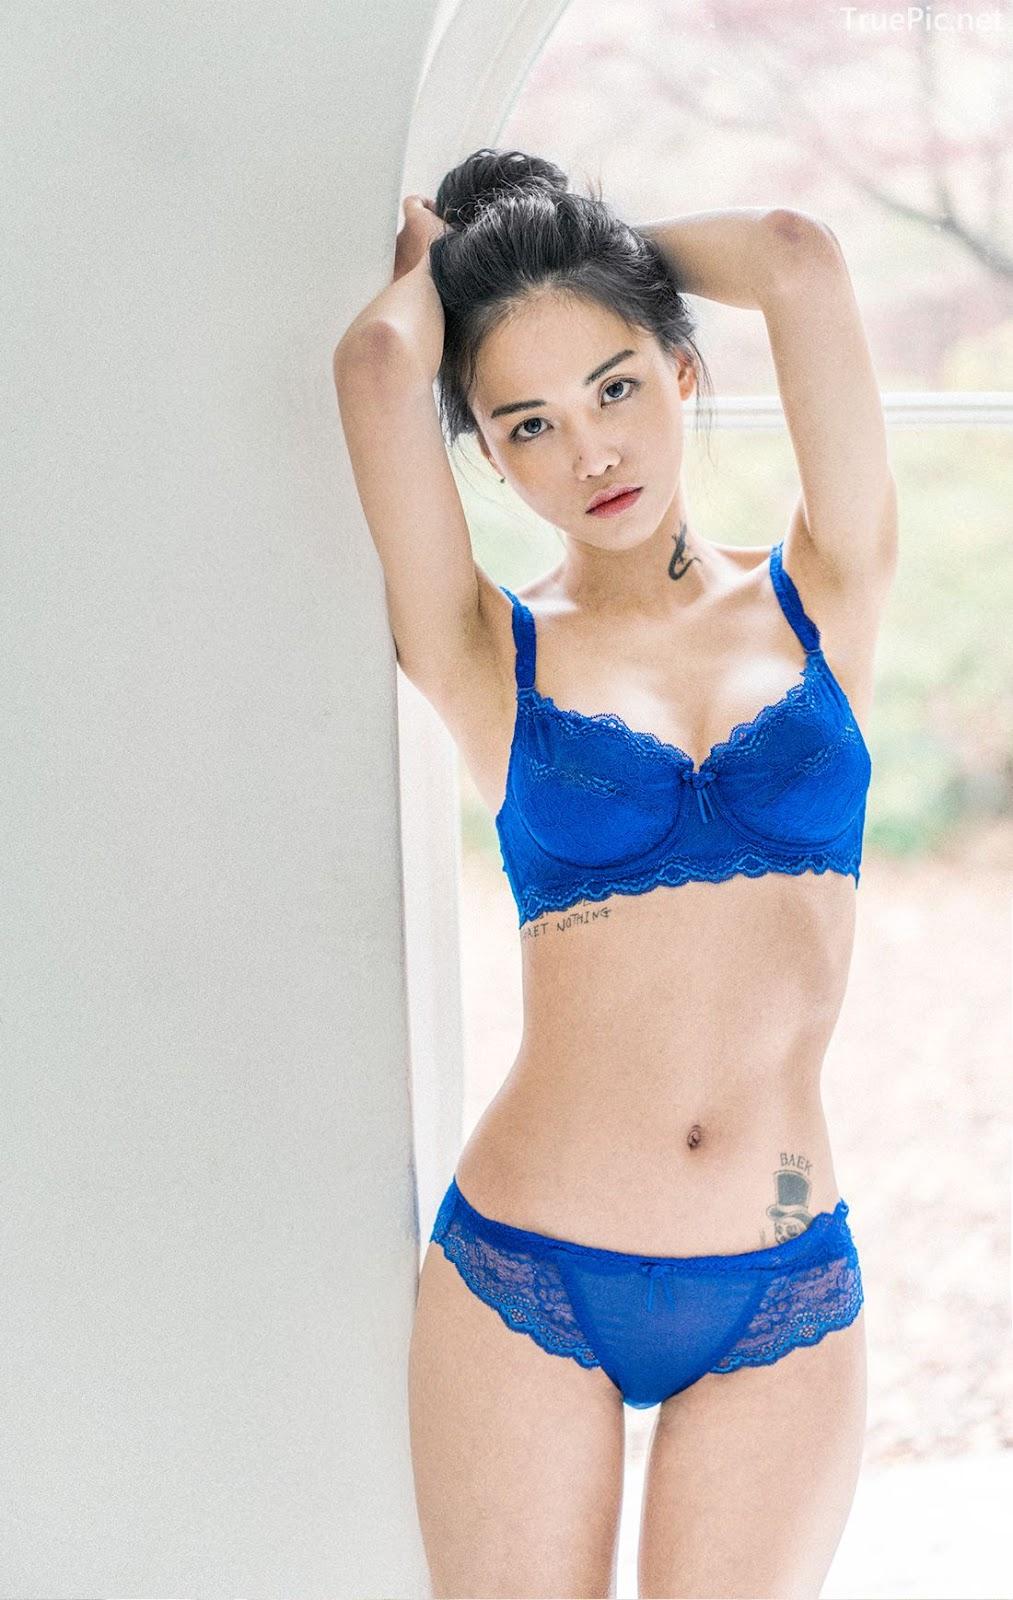 Korean Fashion Model - Baek Ye Jin - Sexy Lingerie Collection - TruePic.net - Picture 5